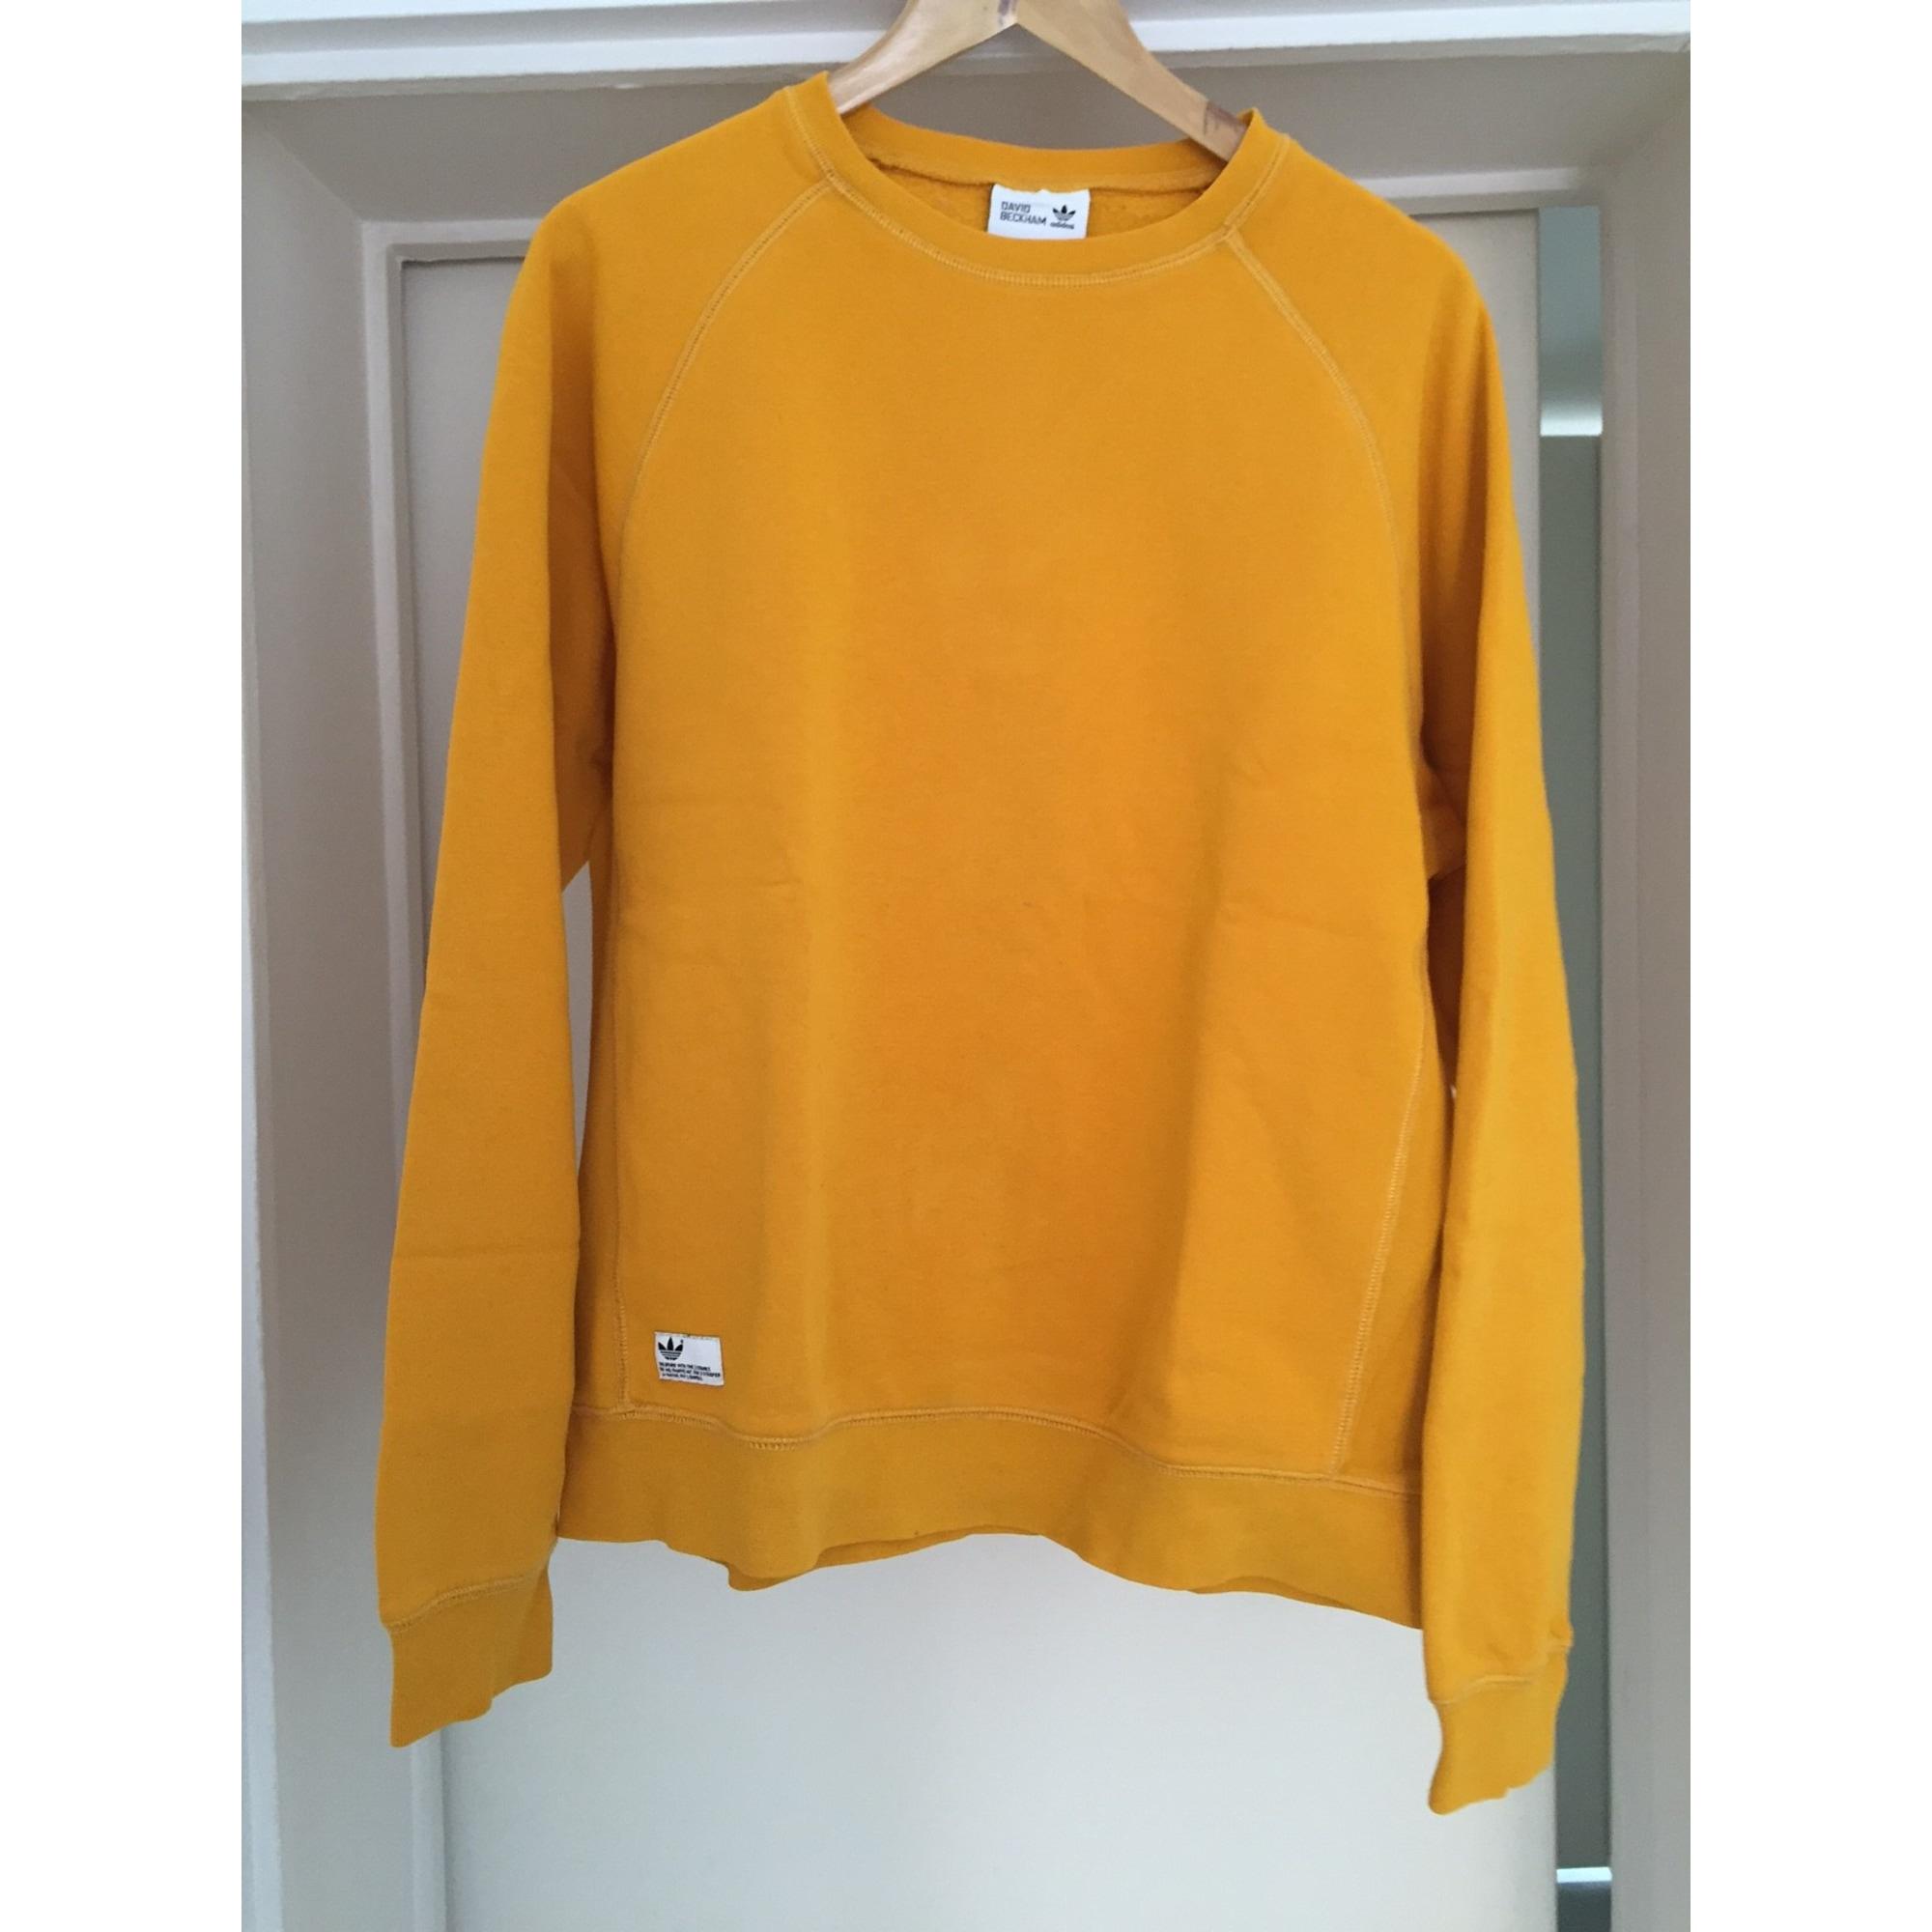 985afdbae47b Sweat ADIDAS 2 (M) jaune vendu par Danielevans - 4991942